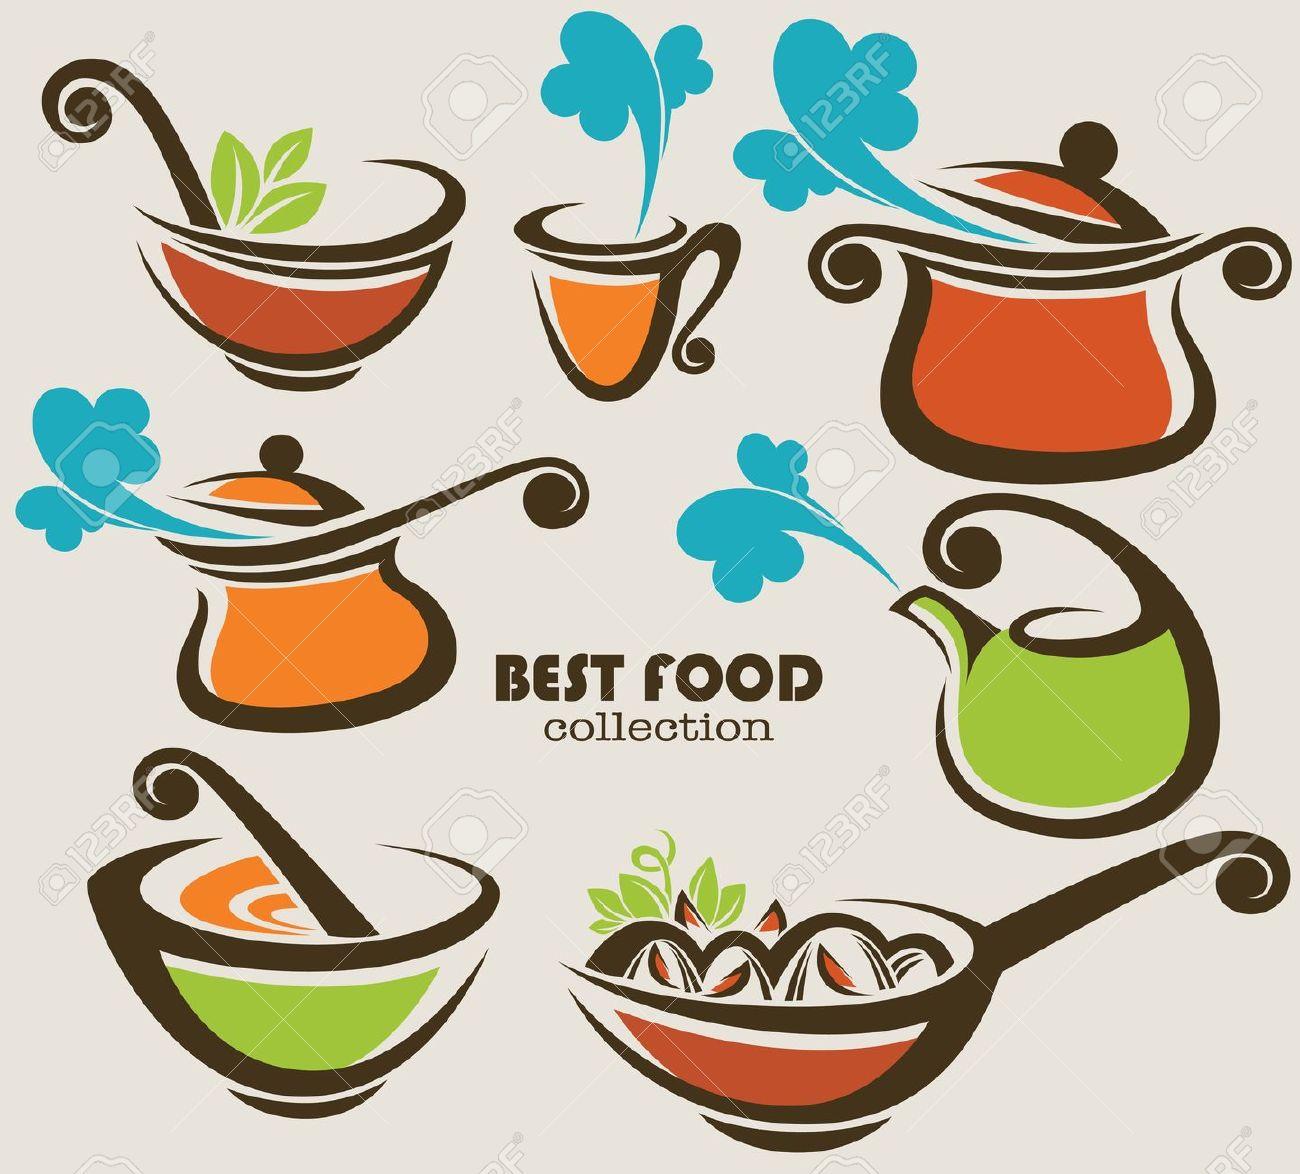 Raccolta Di Attrezzature Da Cucina E Simboli Alimentari Clipart.